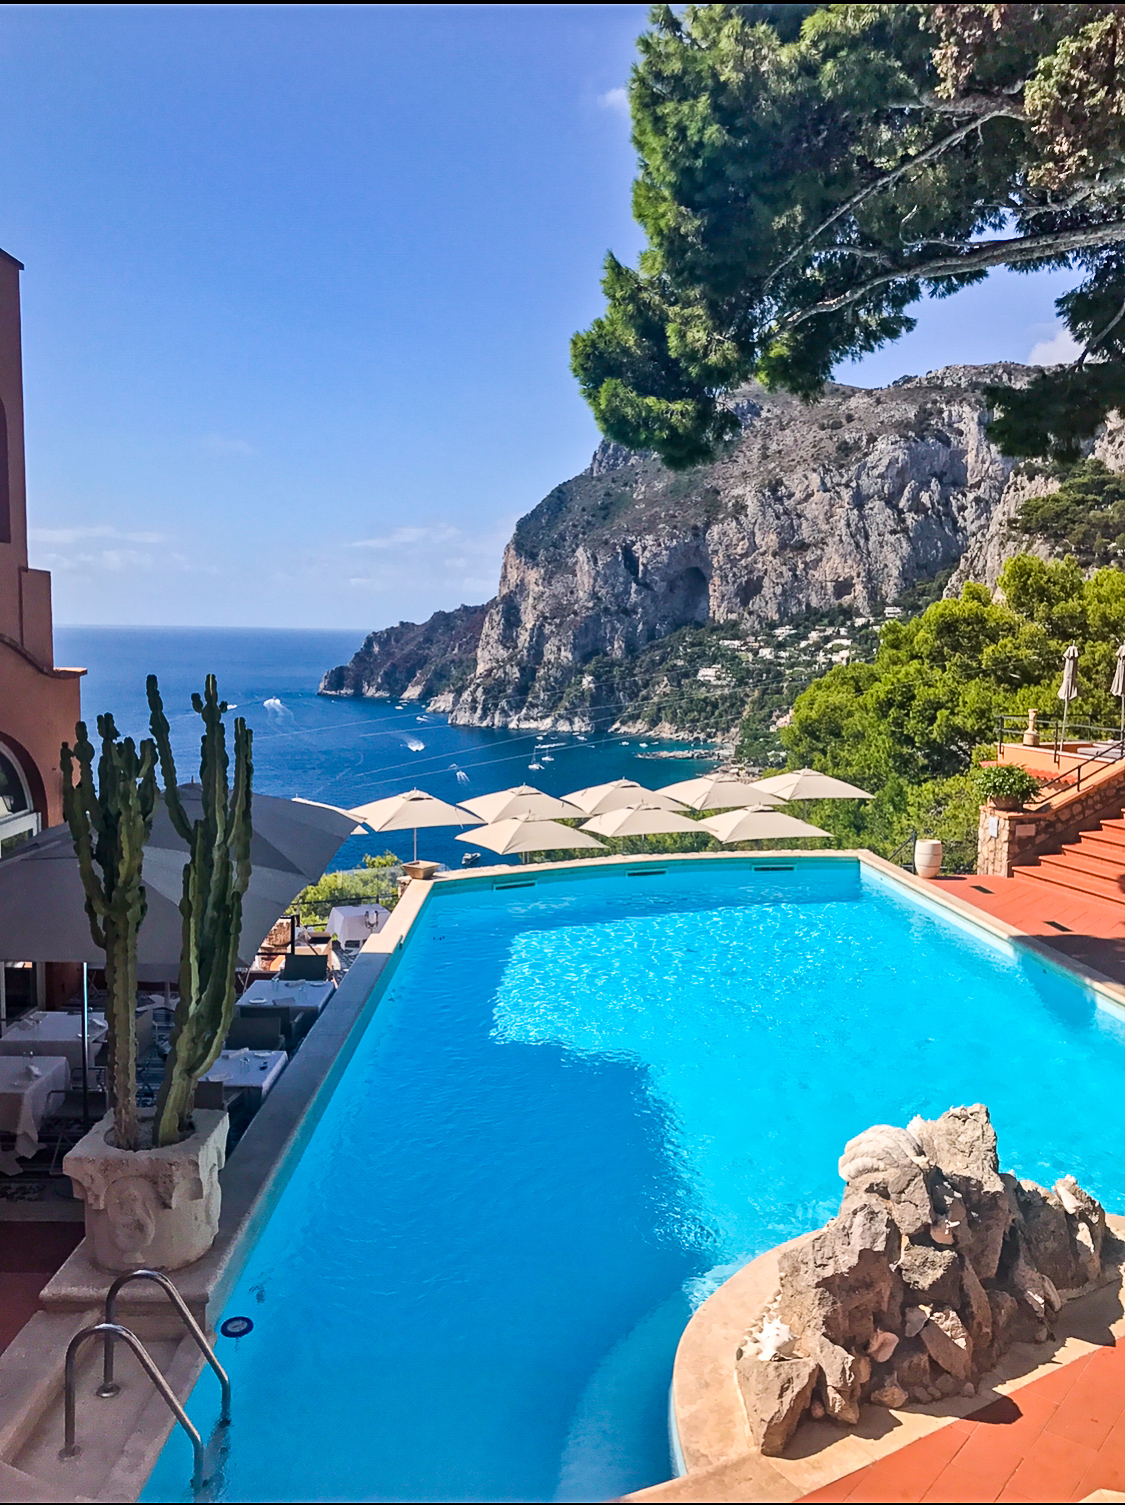 Where to Stay in Capri Italy Amalfi Coast | coupleinthekitchen.com